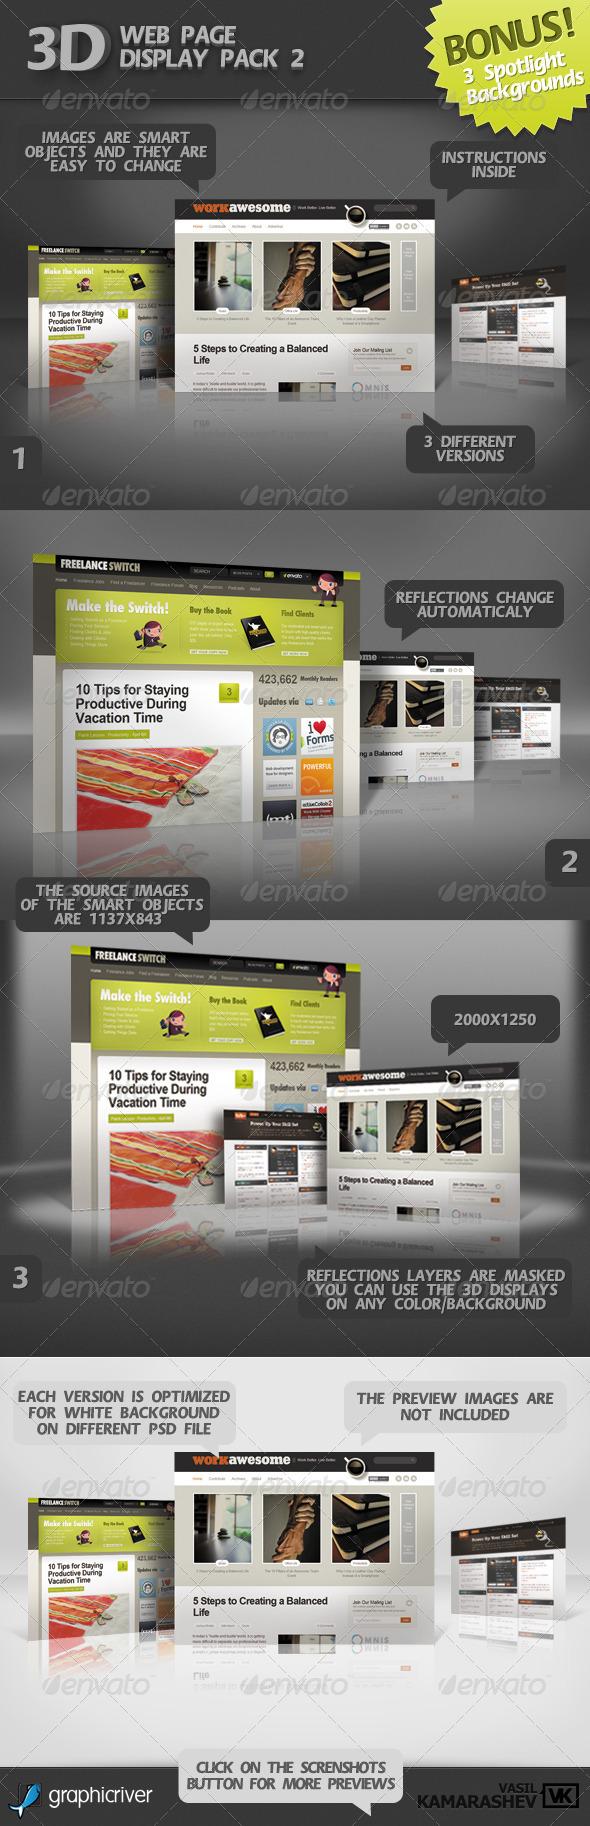 GraphicRiver 3D Web Page Display Pack 2 &BONUS 3 Spotlight BGs 264308